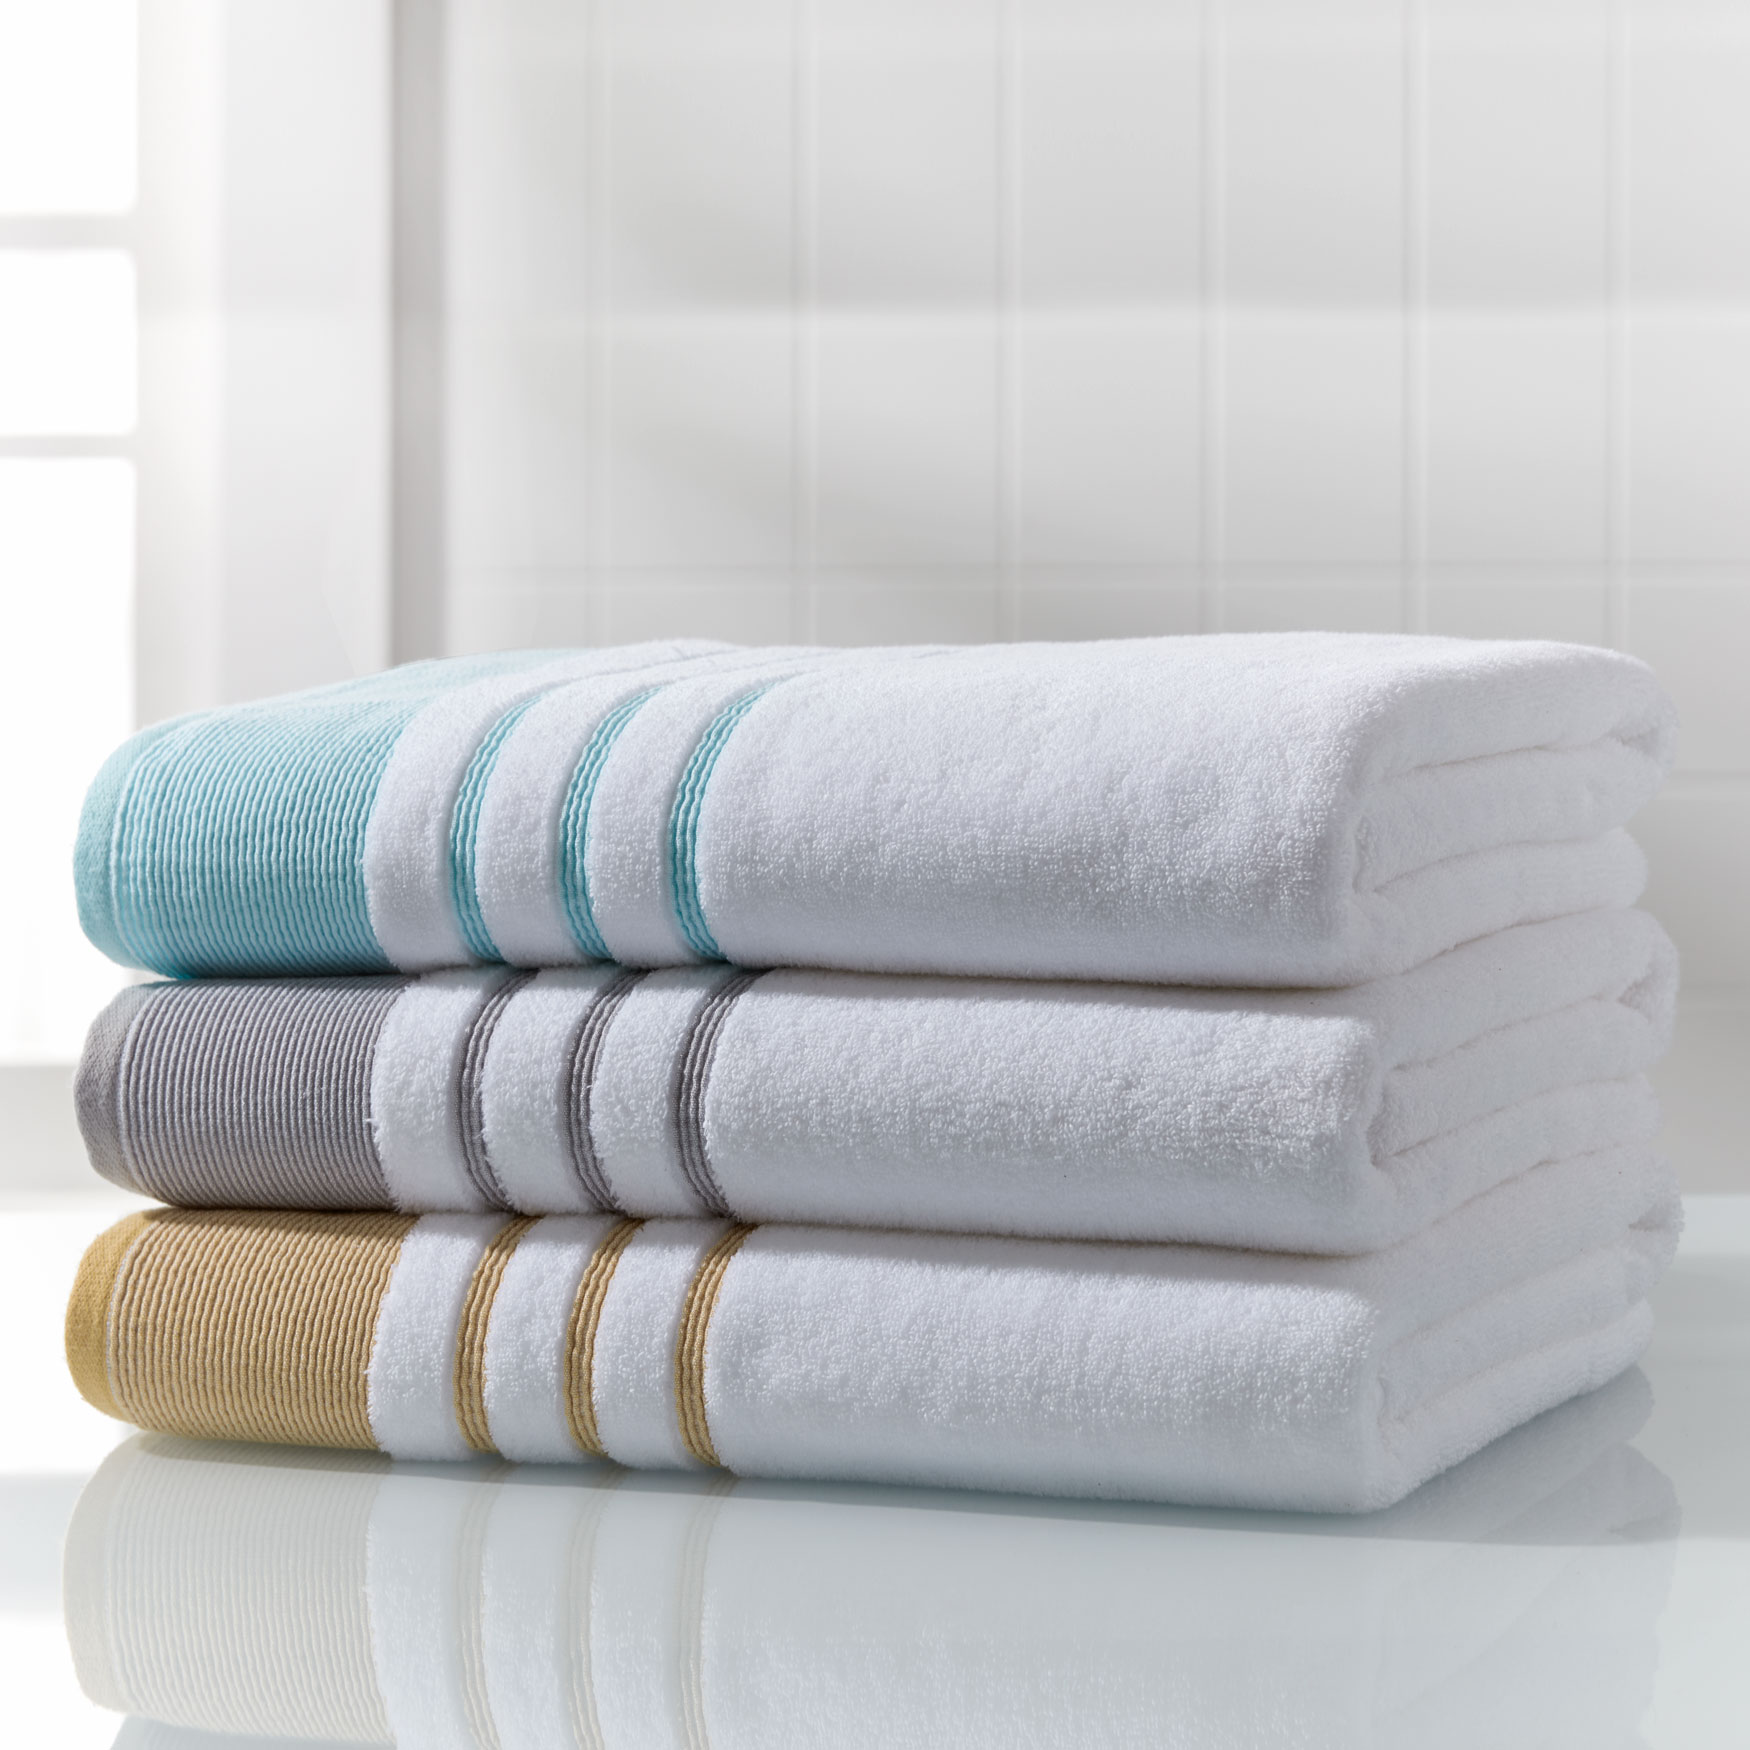 Bath Sheets Oversized: BH STUDIO® Border Oversized Cotton Bath Sheet